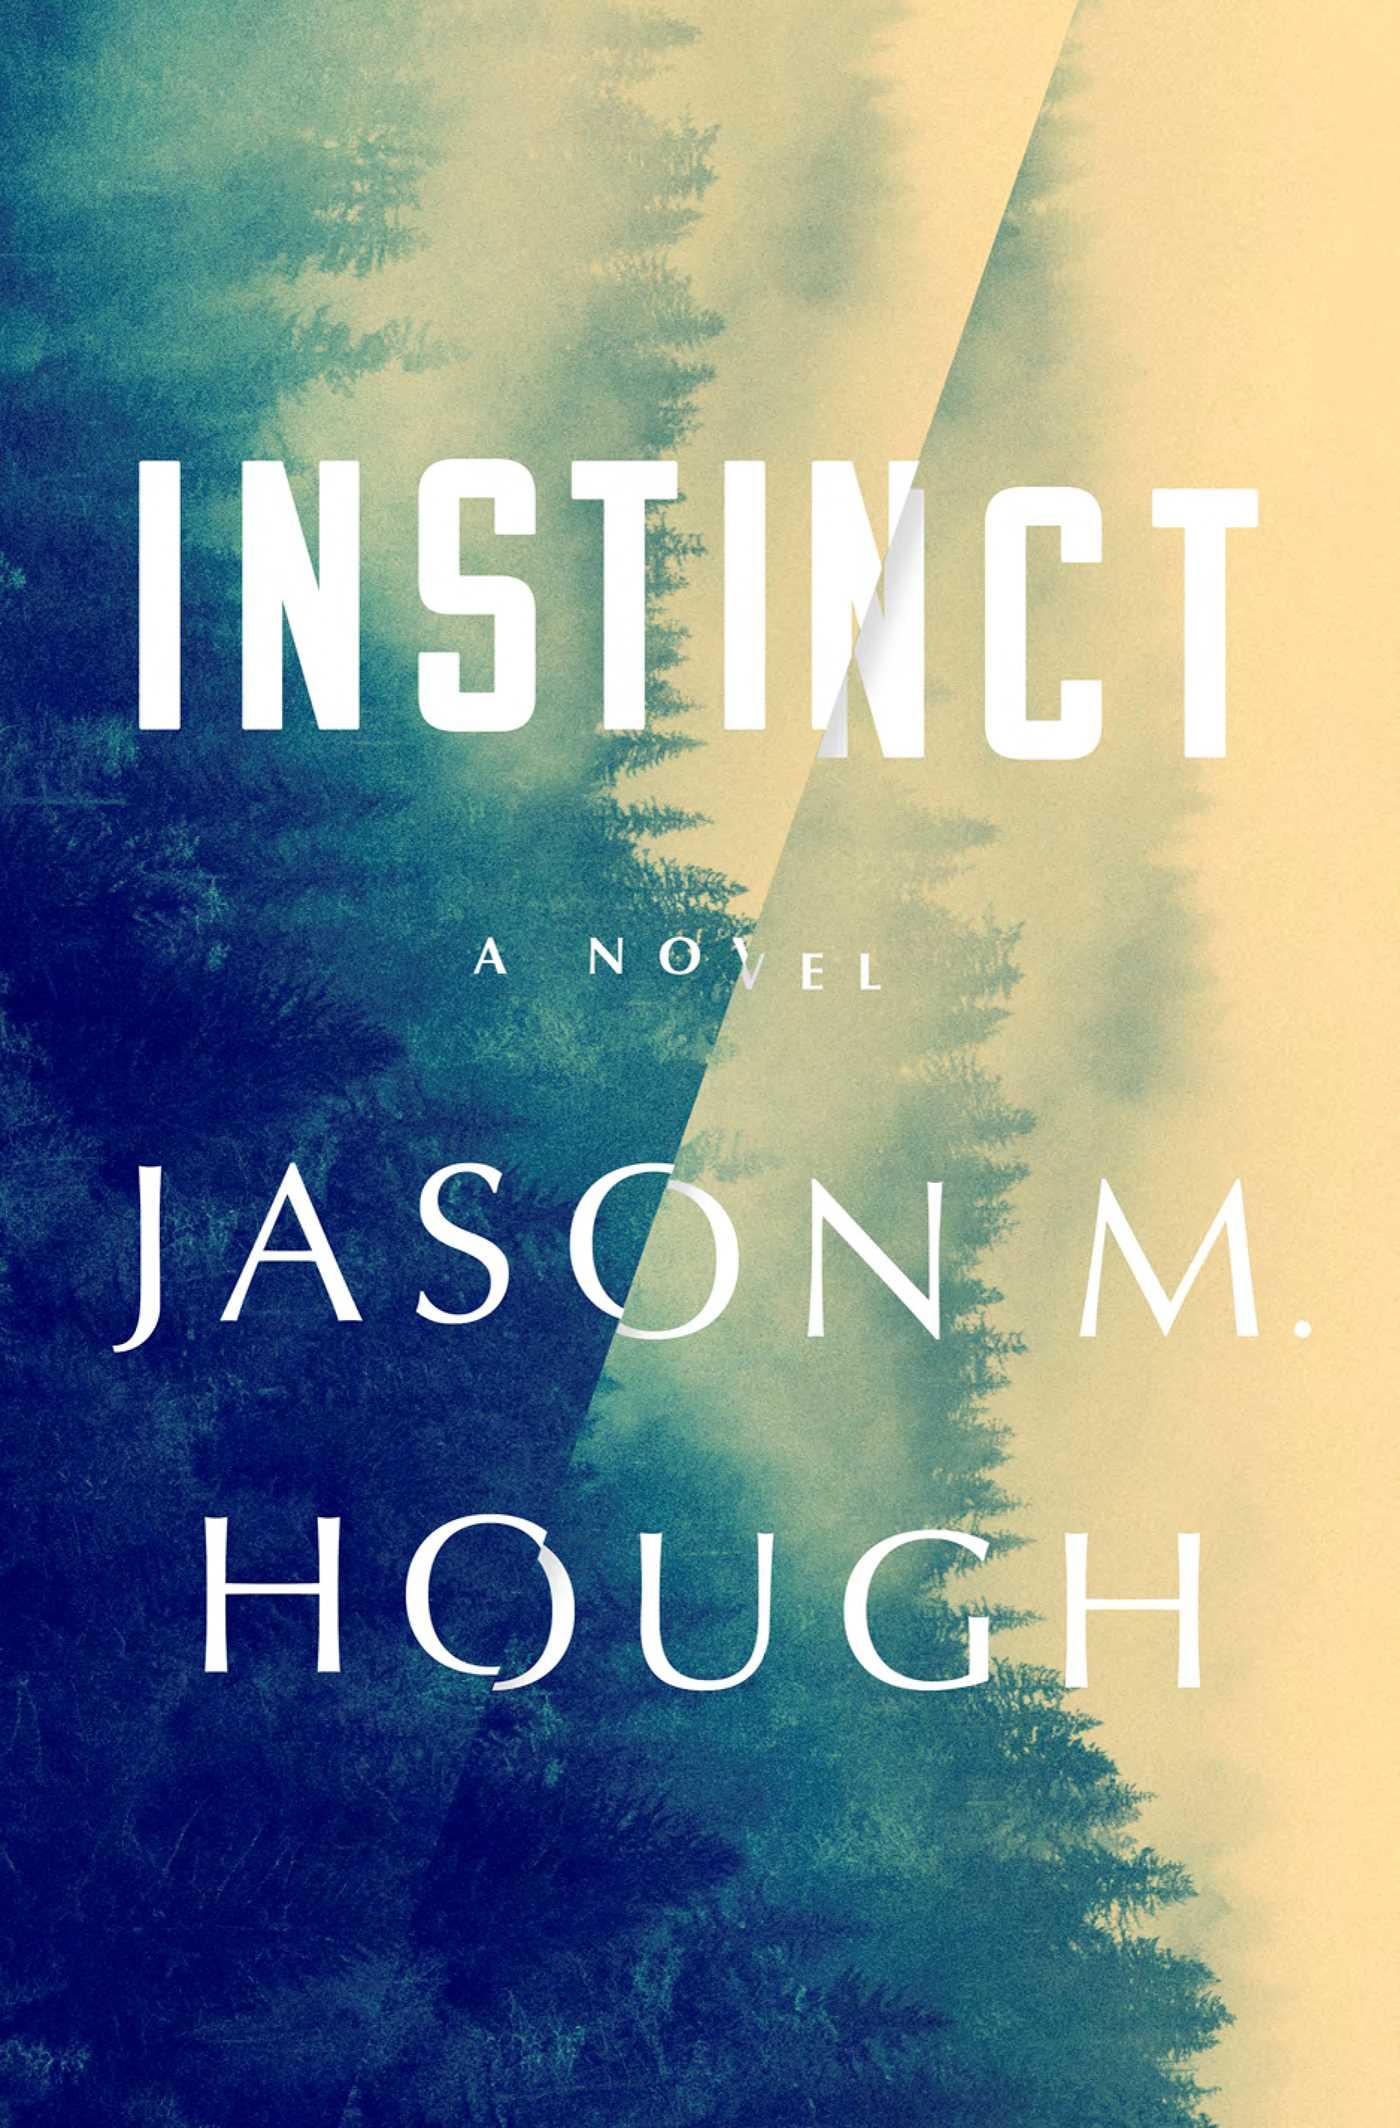 Instinct by Jason Hough